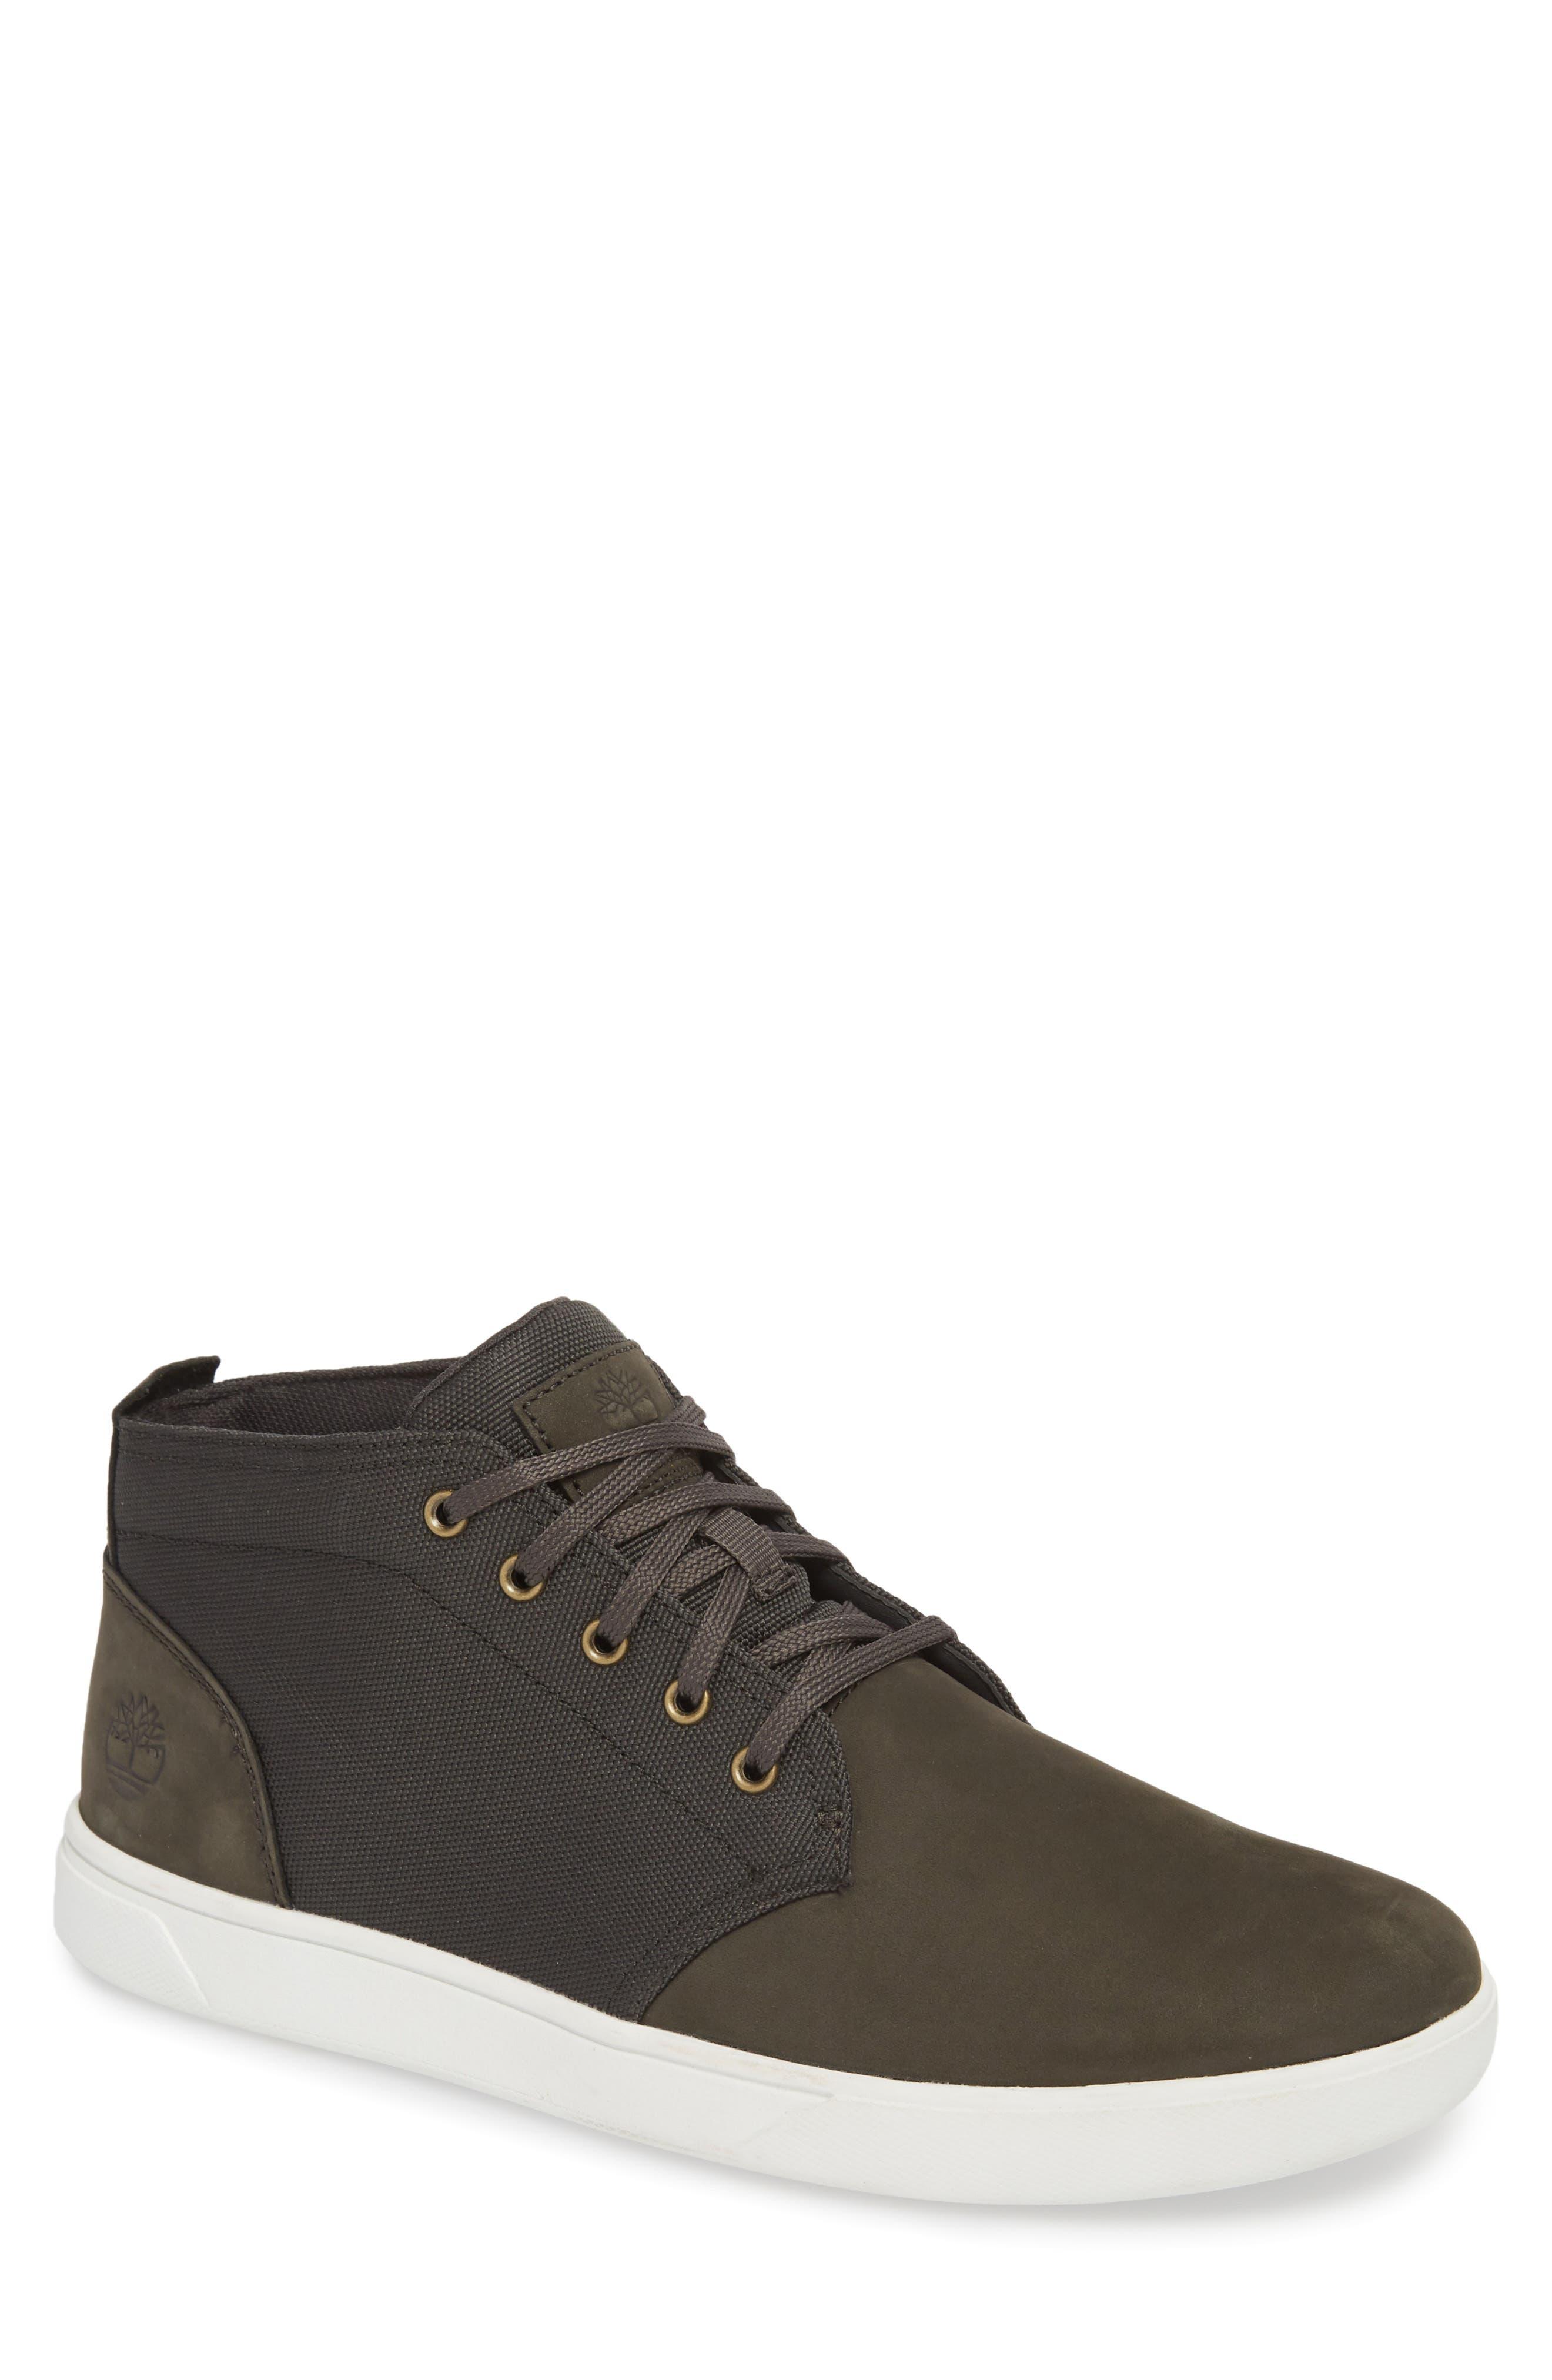 Earthkeepers<sup>™</sup> 'Groveton' Chukka Sneaker,                         Main,                         color, DARK GREEN NUBUCK